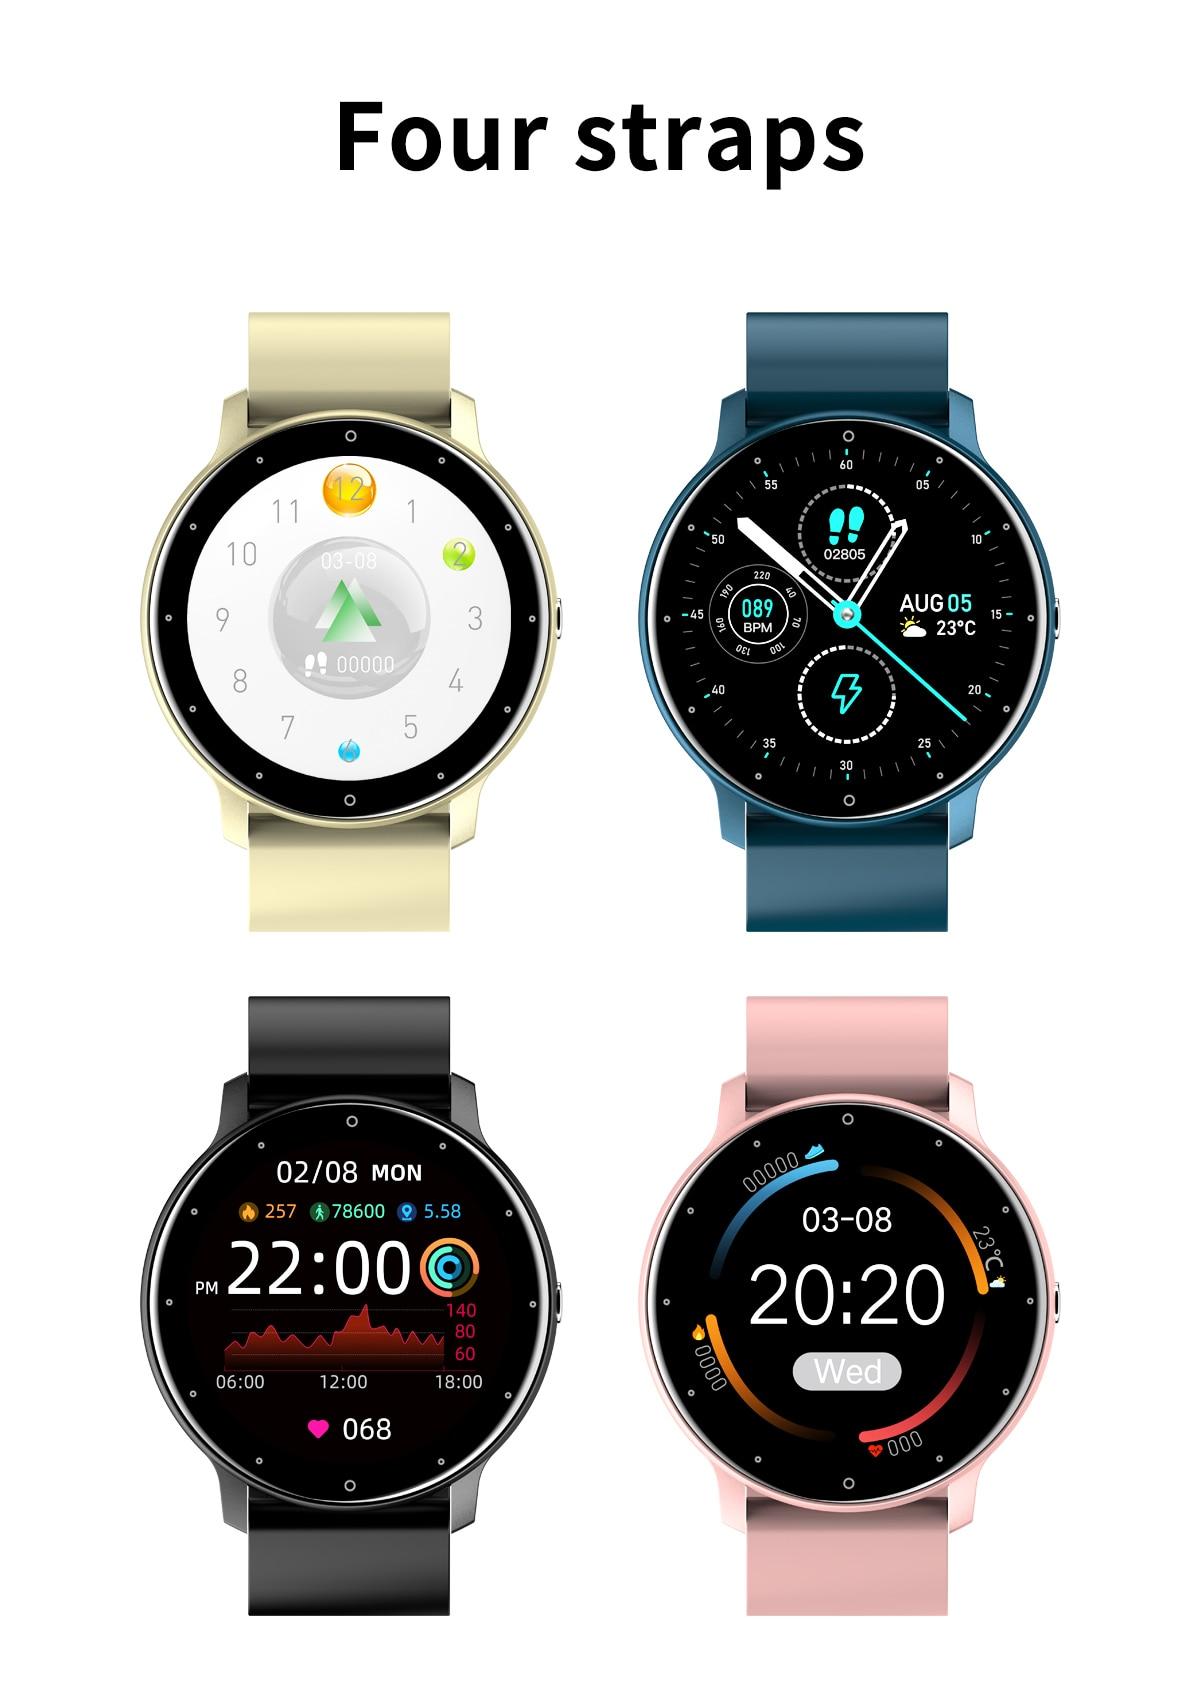 Hcc61ad1538a24c95a5dd79134065d485r LIGE 2021 Fashion Smart Watch Men Fitness Bracelet Heart Rate Blood Pressure Monitoring Sports Tracker Smartwatch Gift for Women